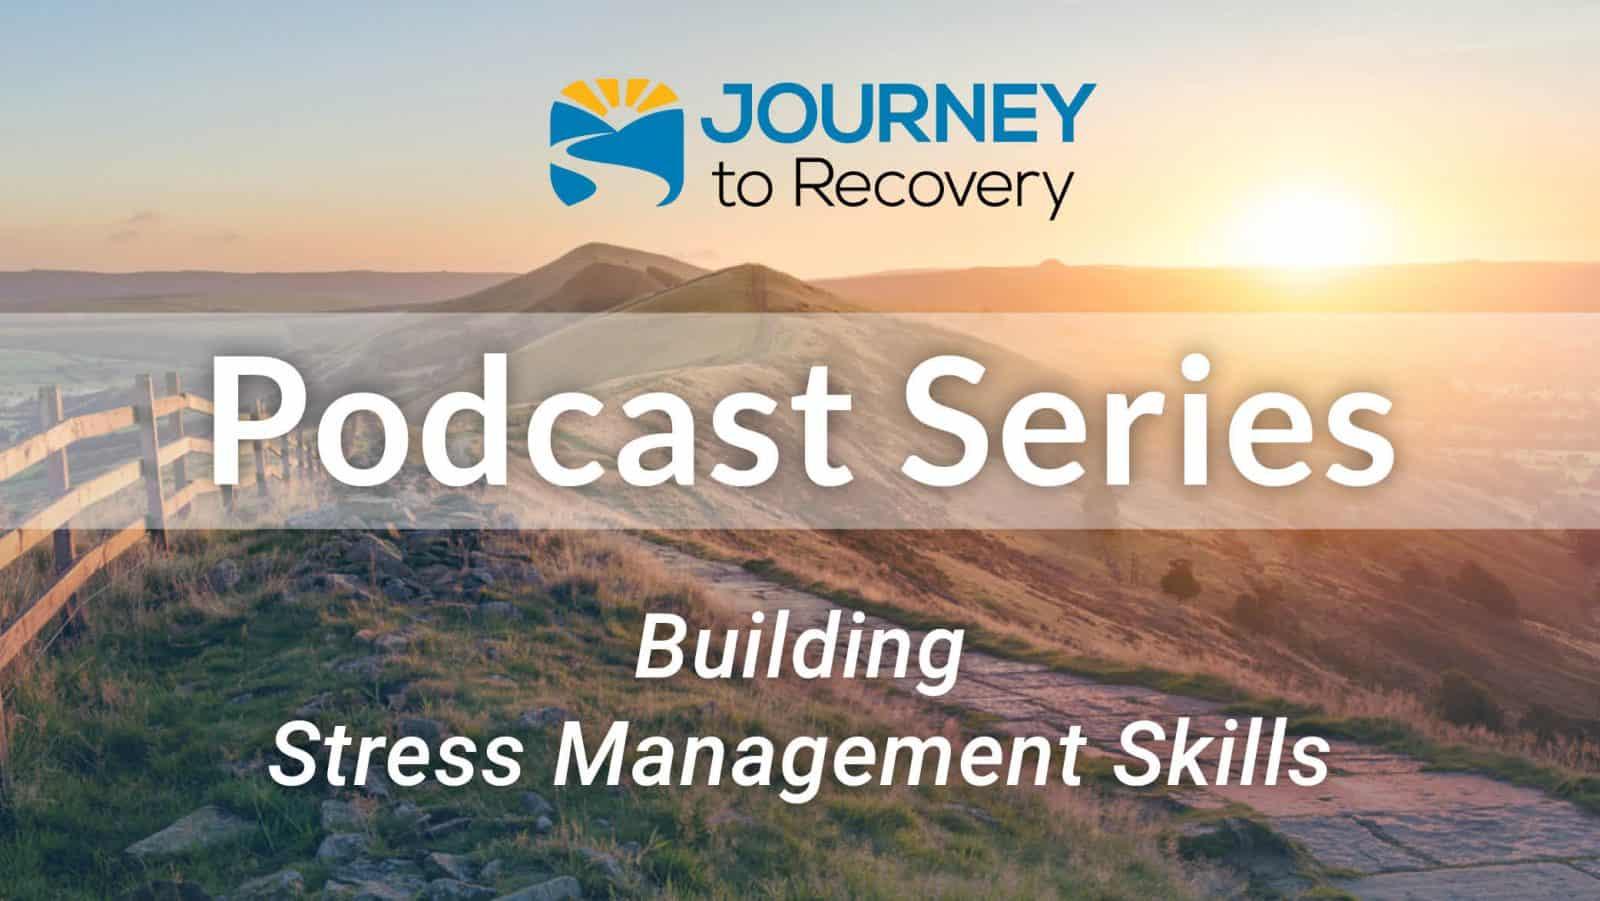 Building Stress Management Skills